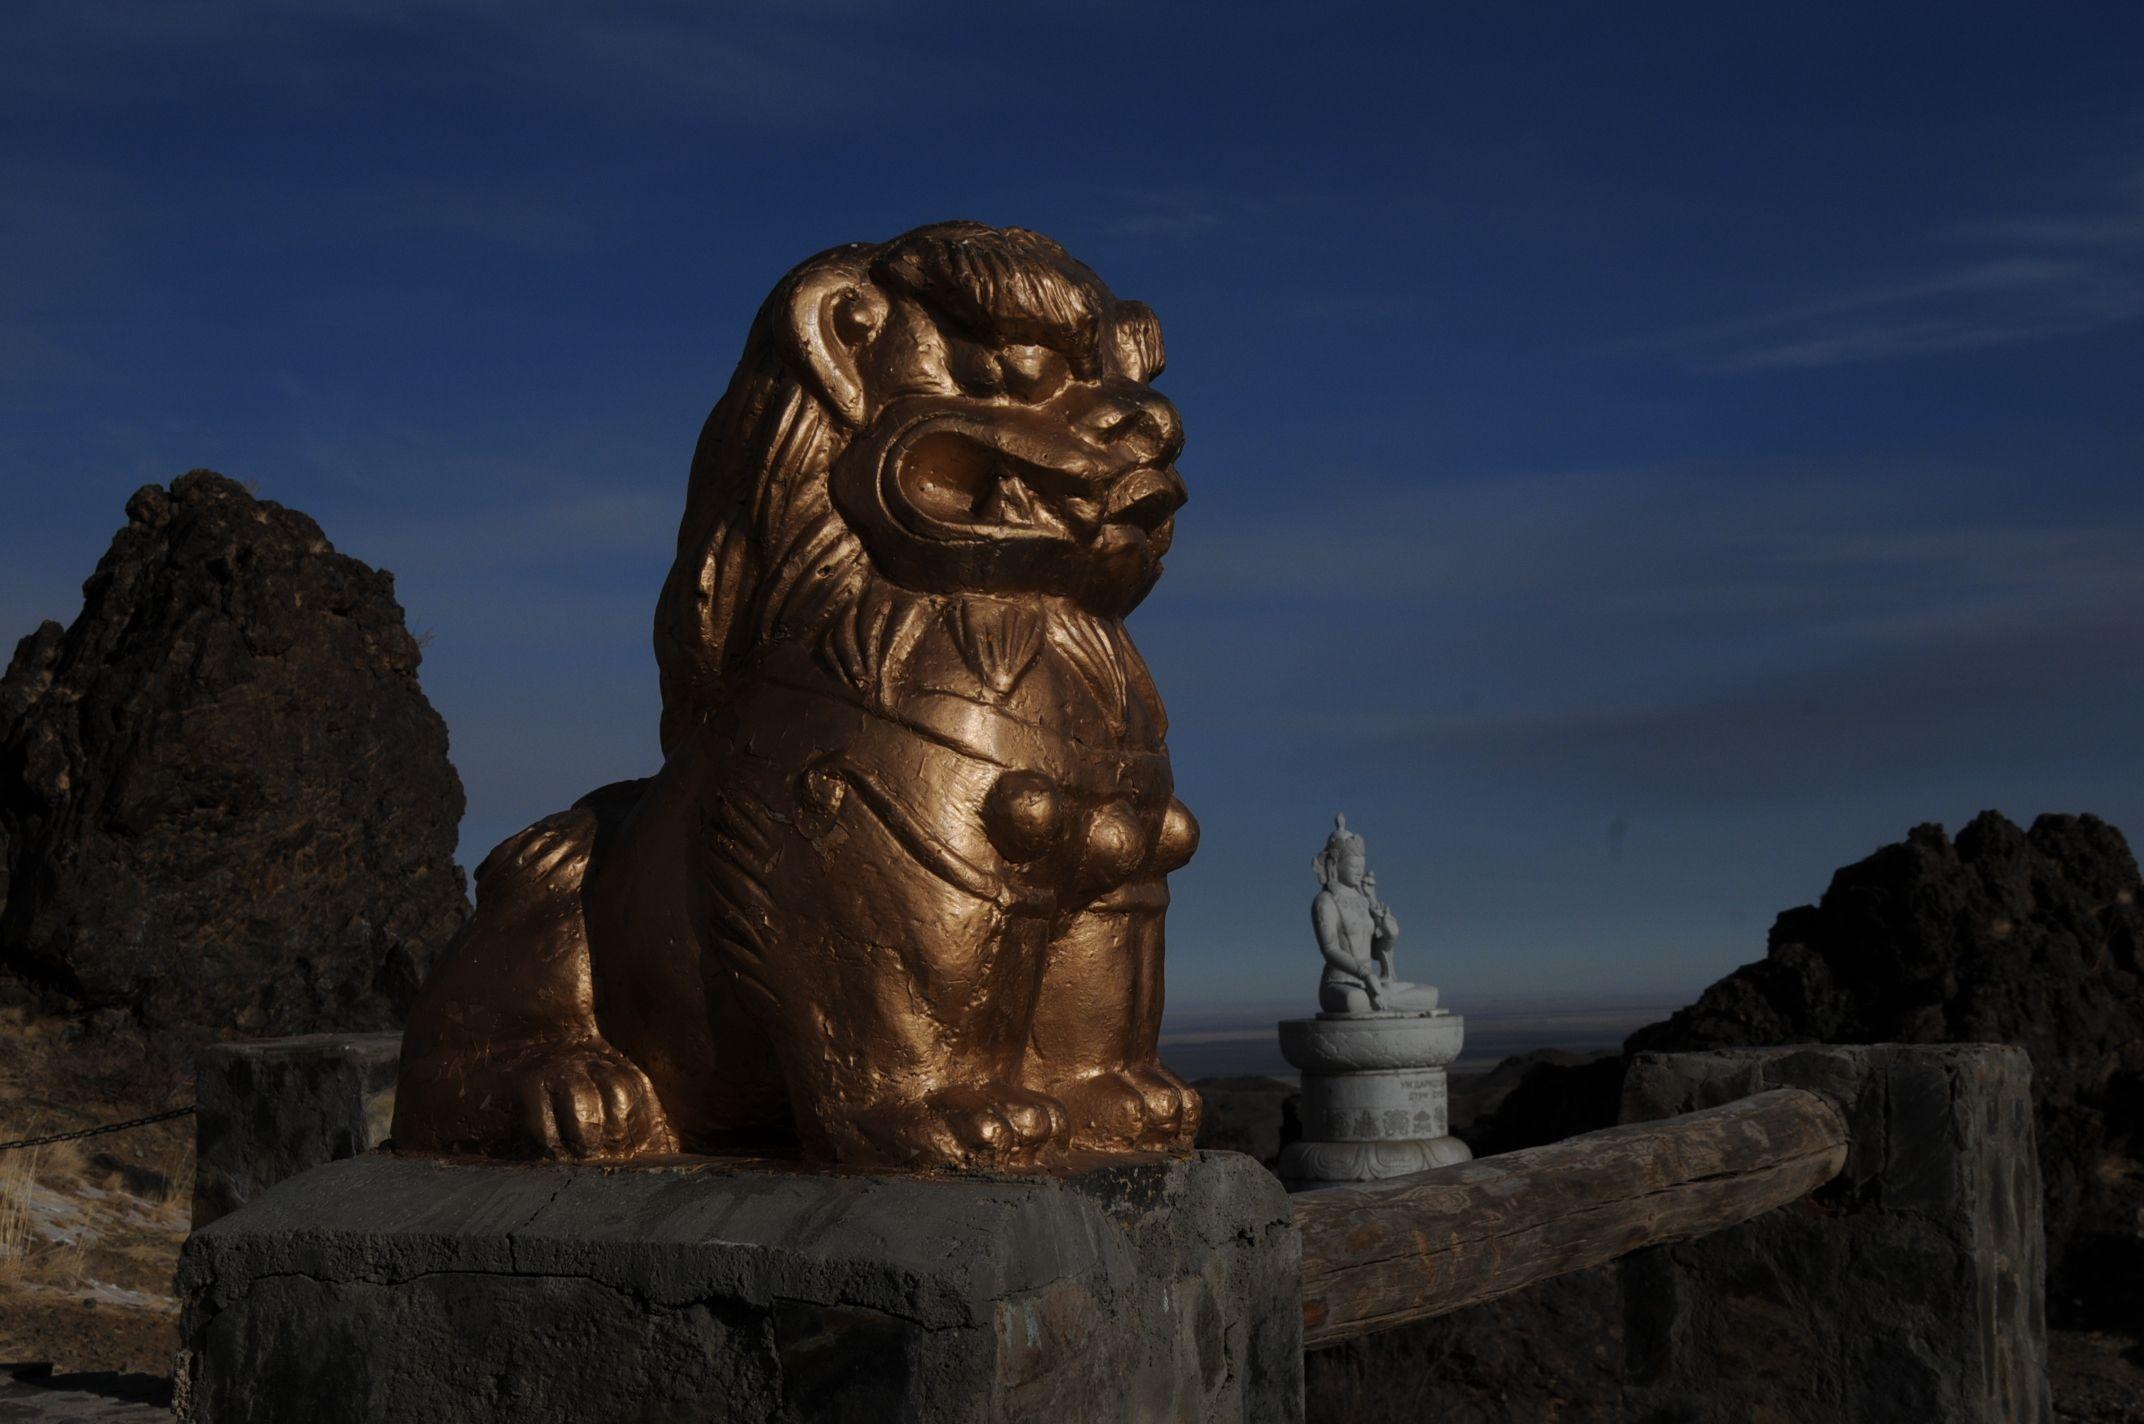 At a Mountain Temple in Gobi Gurvan Saikhan National Park. Mongolian Gobi Desert. www.stonehorsemongolia.com